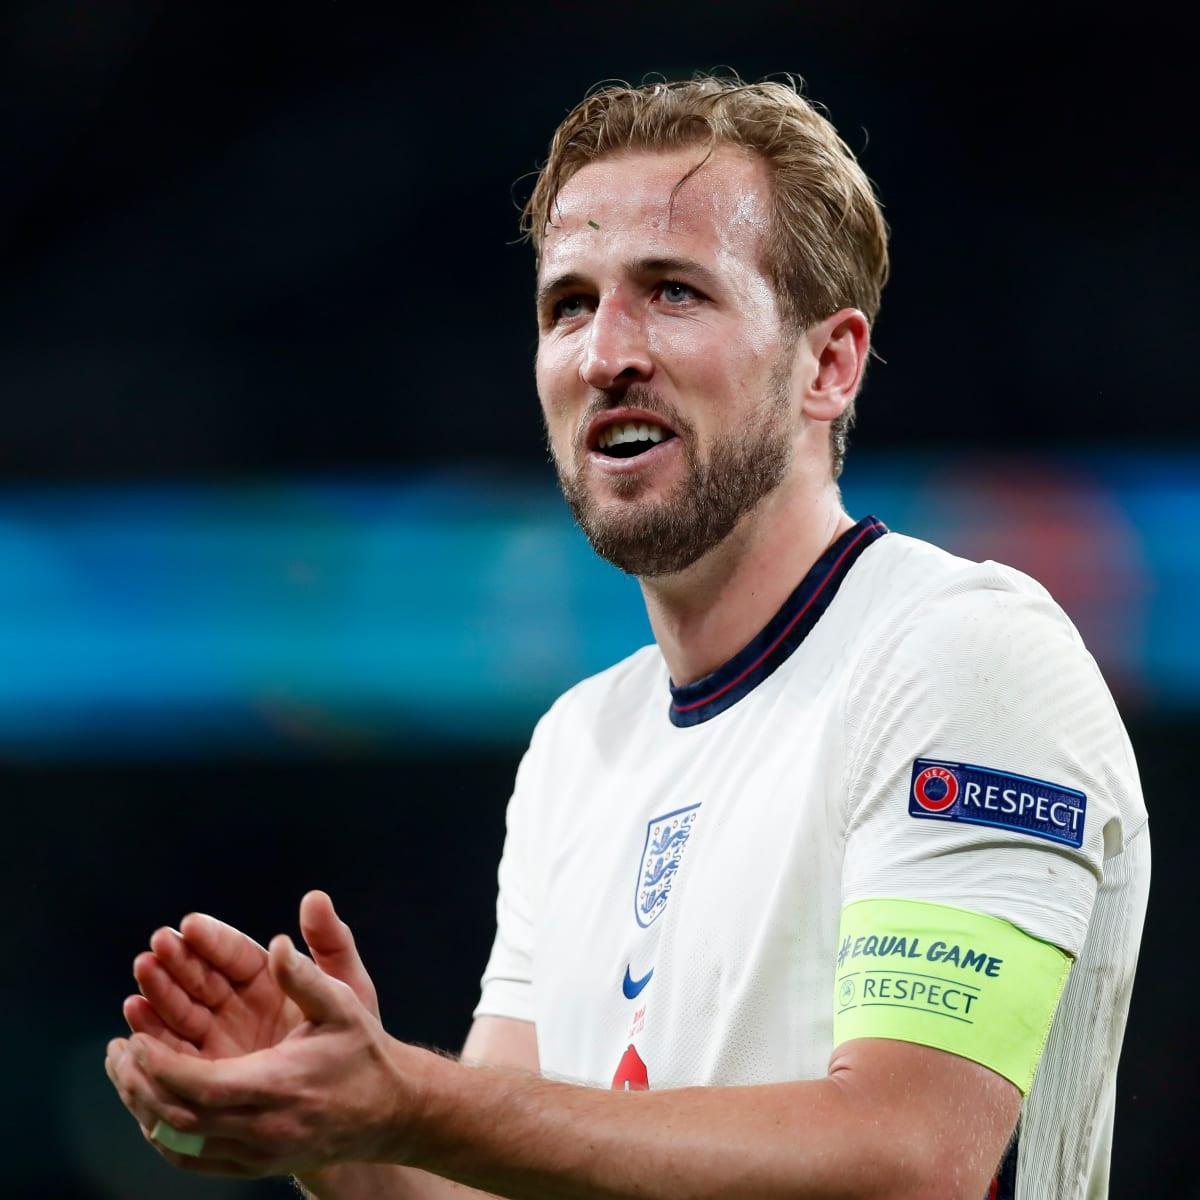 Harry Kane fails to return to Tottenham training amid interest from Man City, Chelsea | Peakvibez